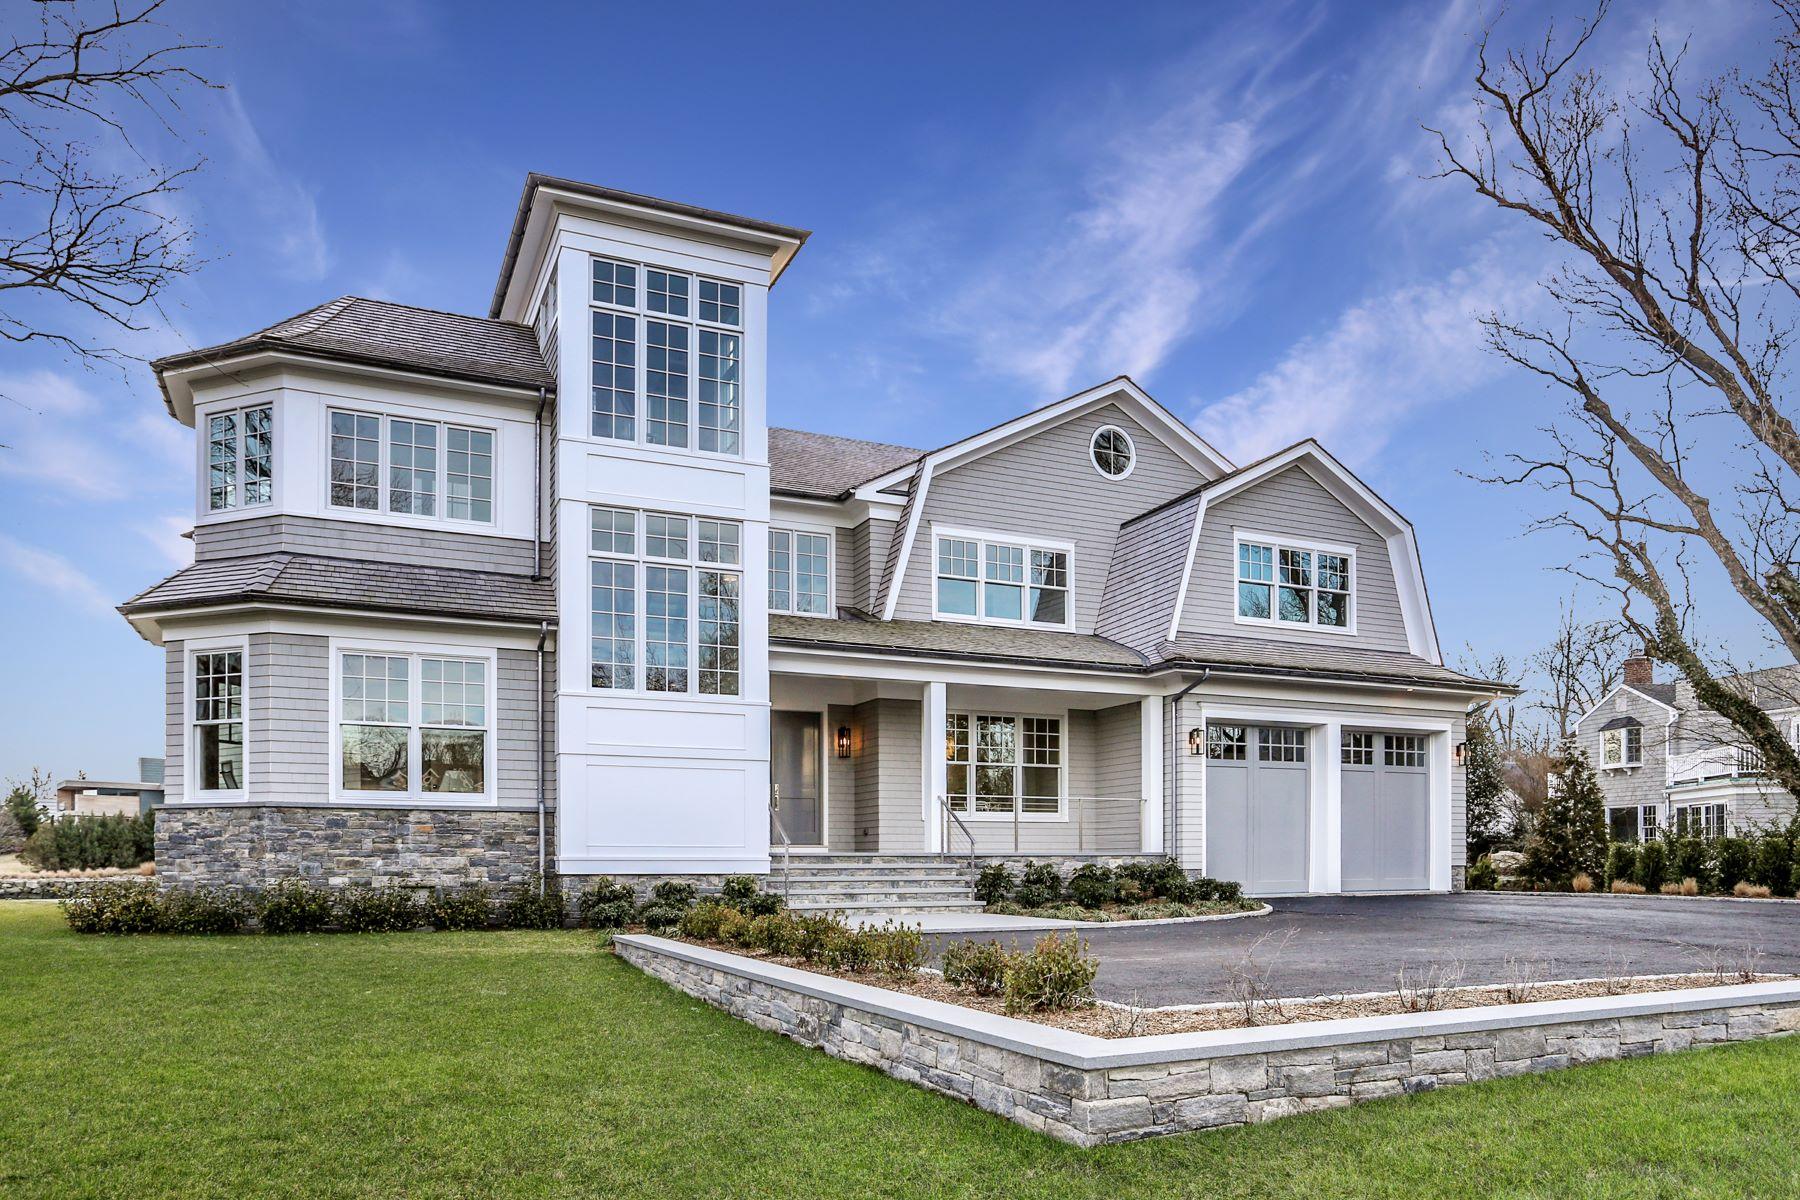 独户住宅 为 销售 在 4 Philips Lane 4 Philips Lane 拉伊, 纽约 10580 美国